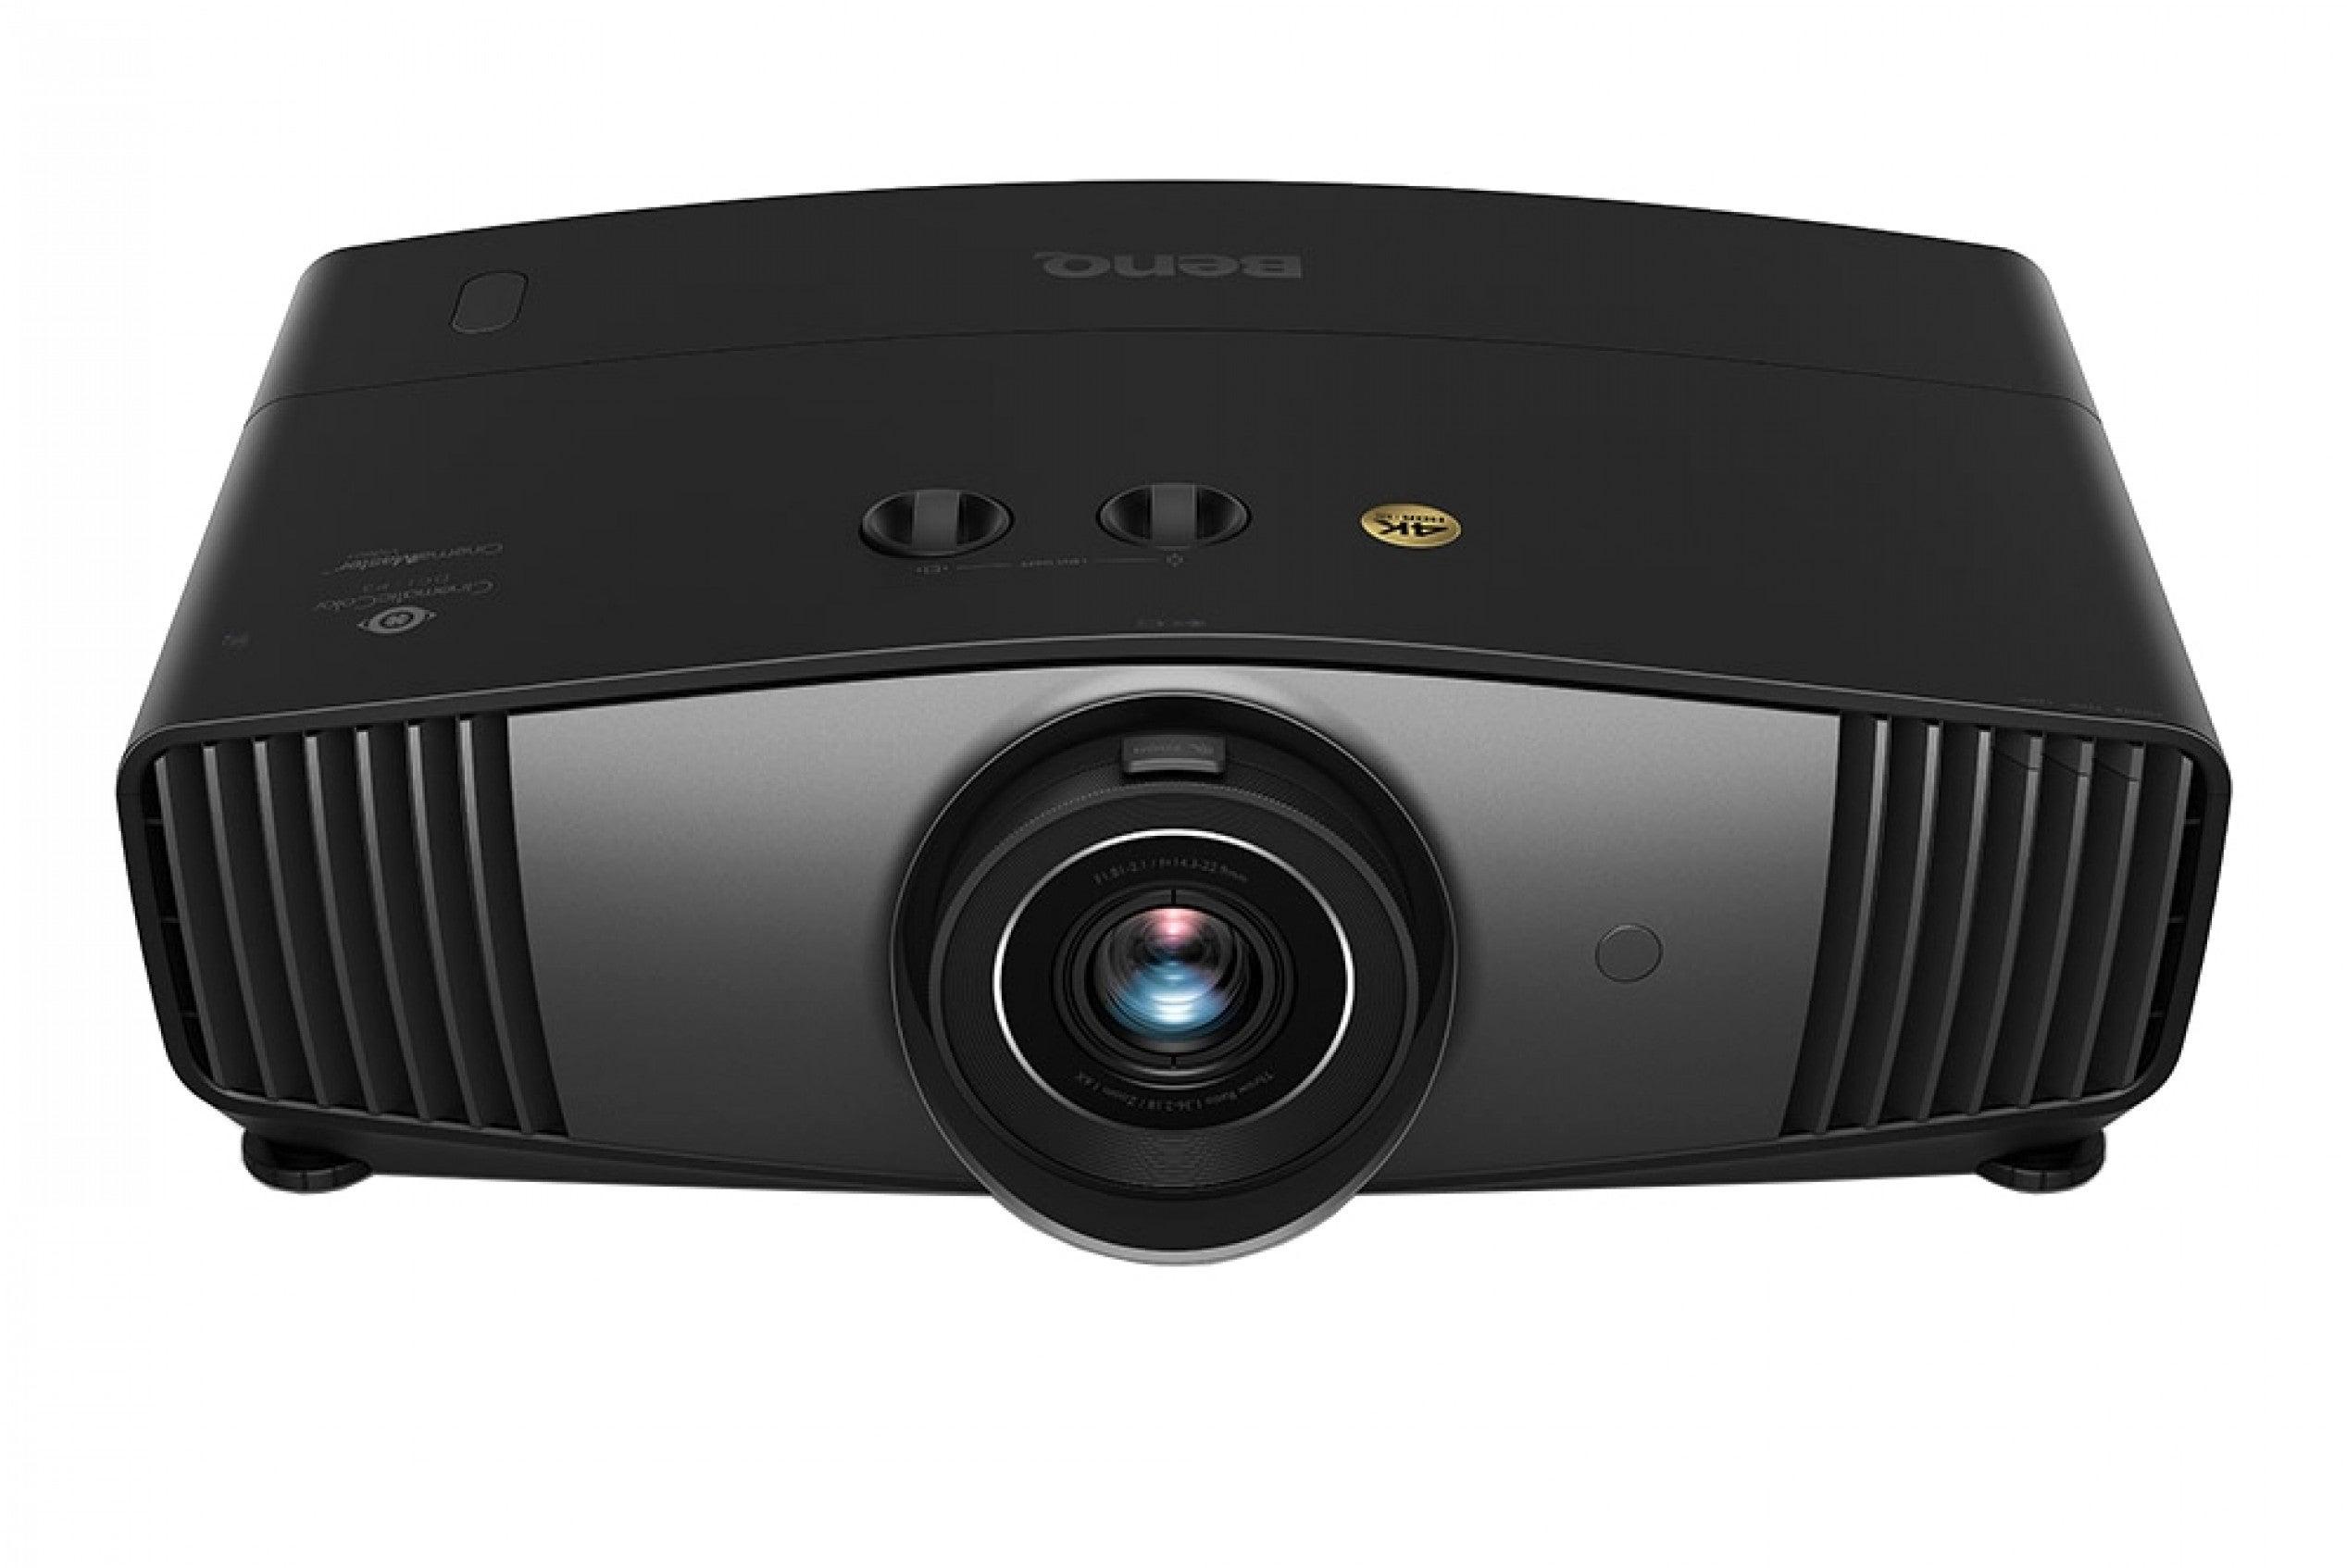 BenQ CinePrime W5700 DLP Projector